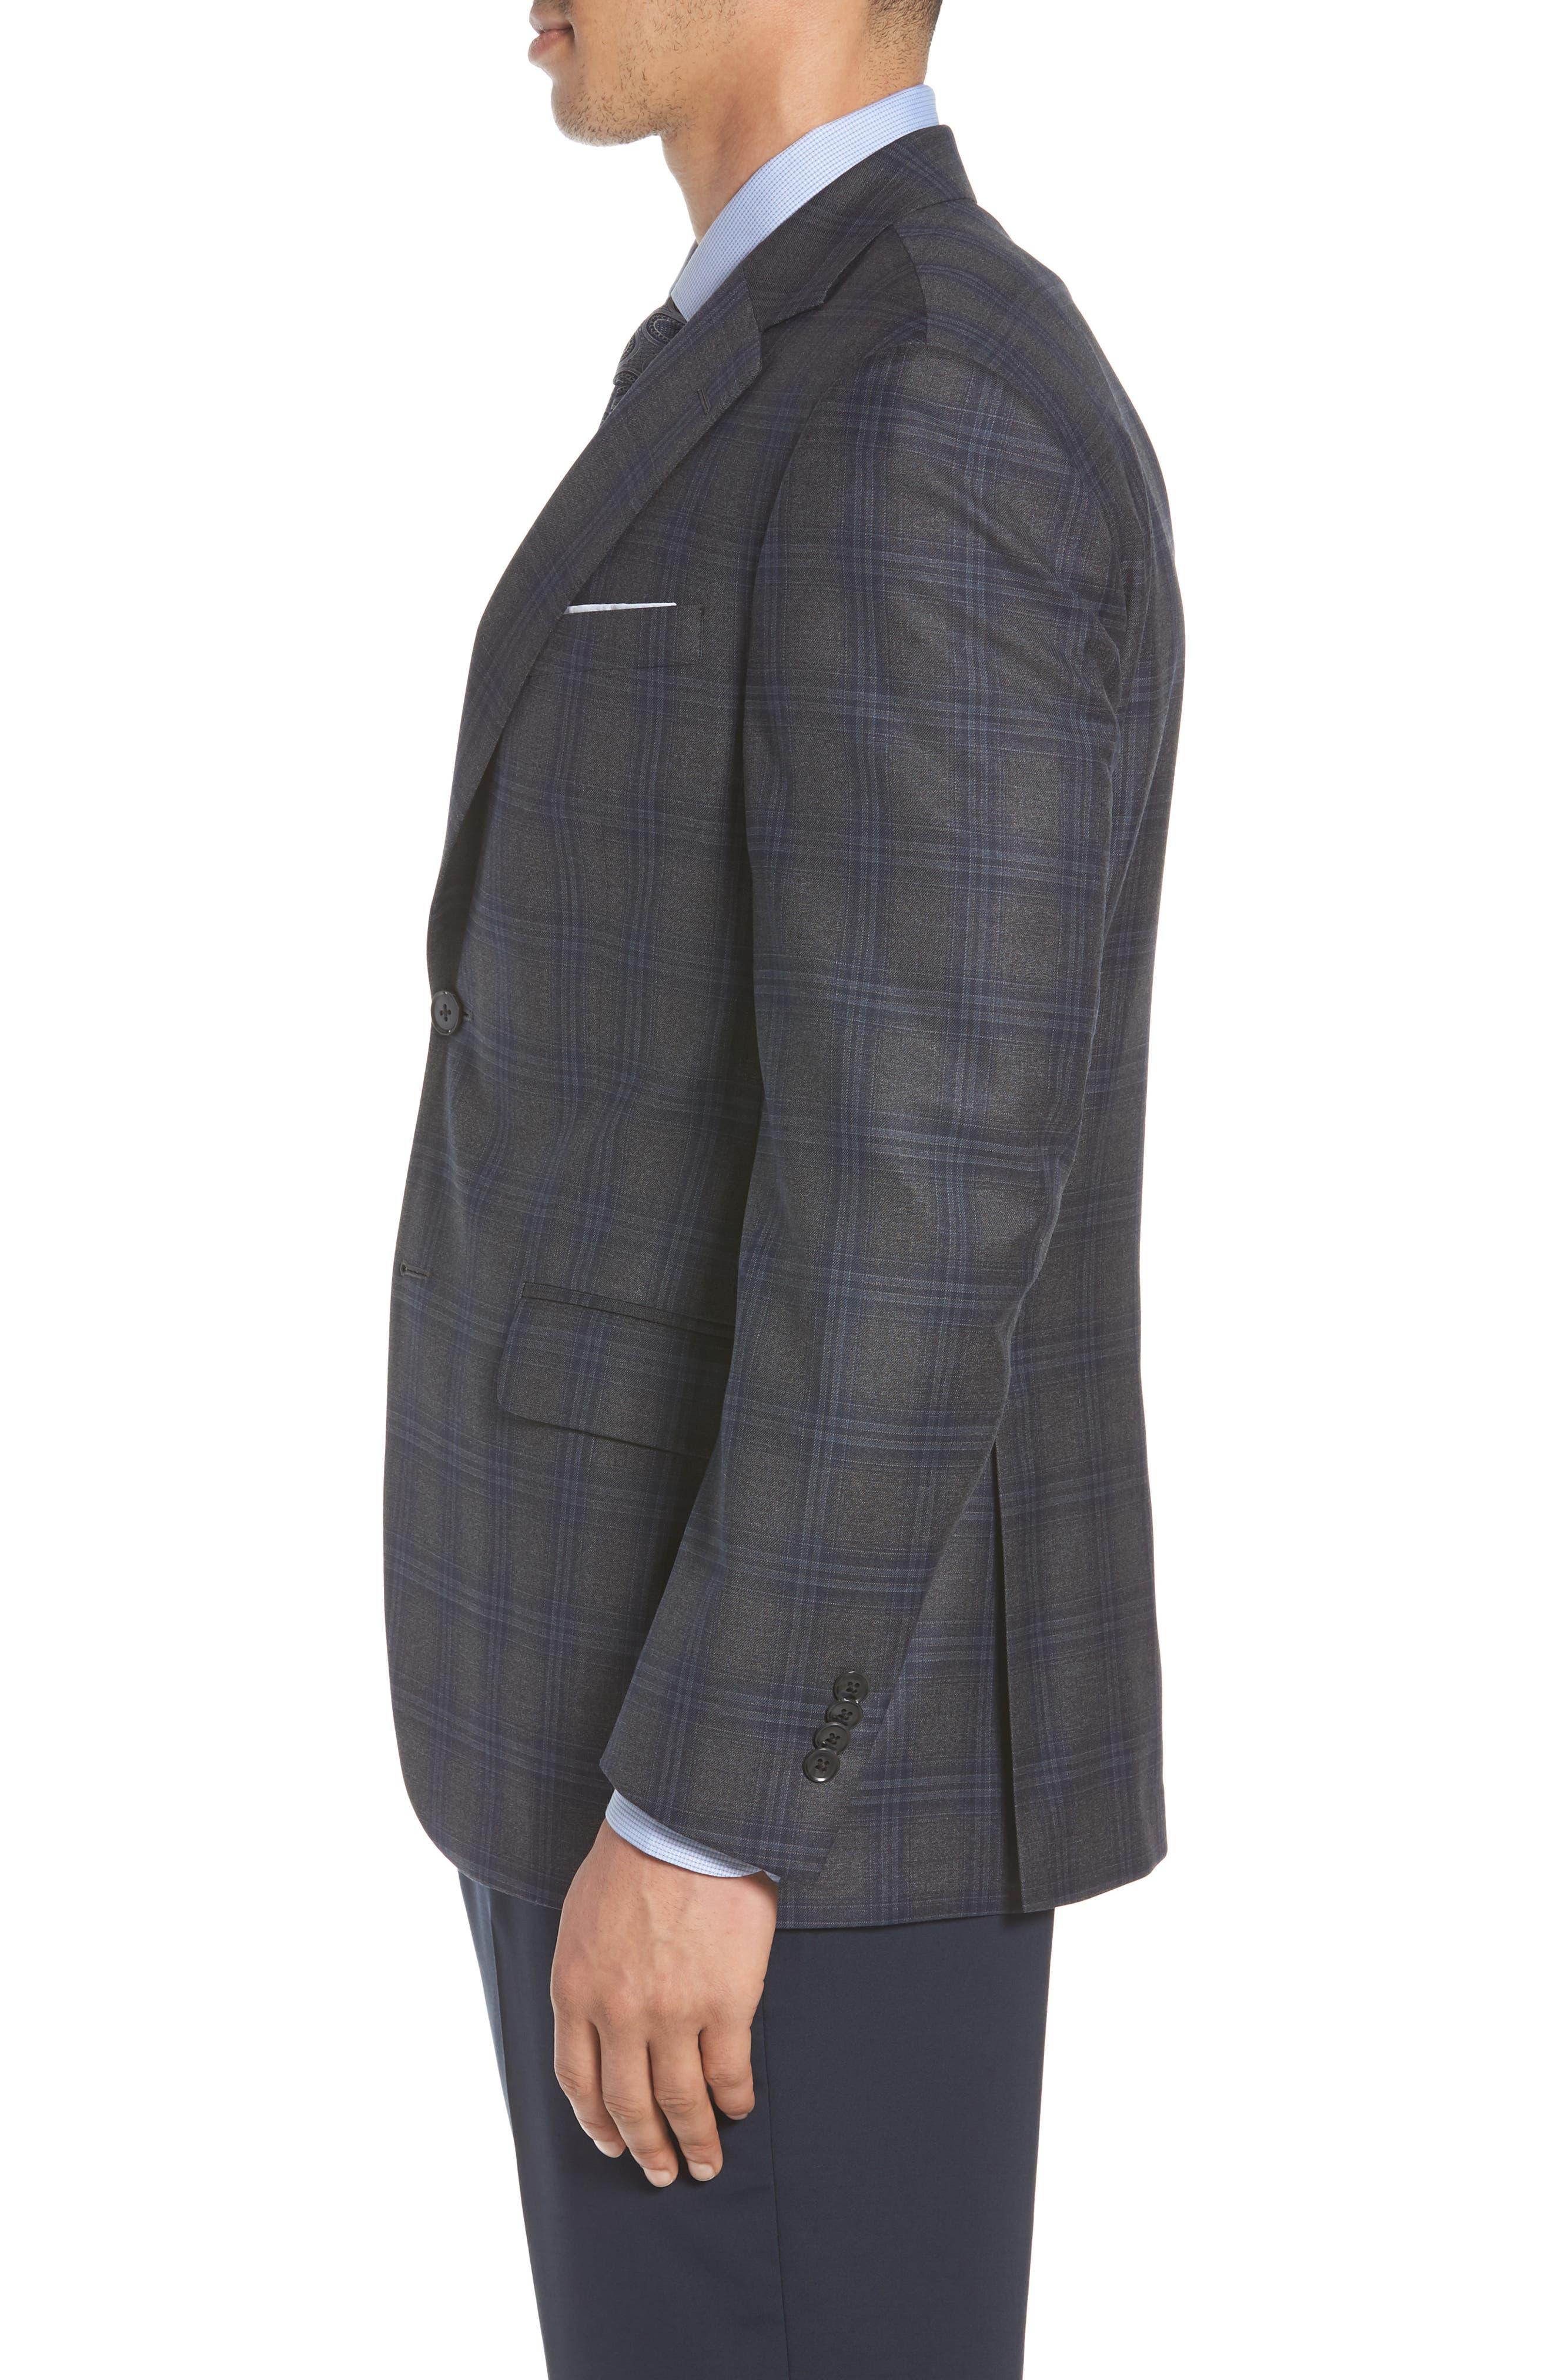 PETER MILLAR,                             Classic Fit Plaid Wool Sport Coat,                             Alternate thumbnail 3, color,                             020